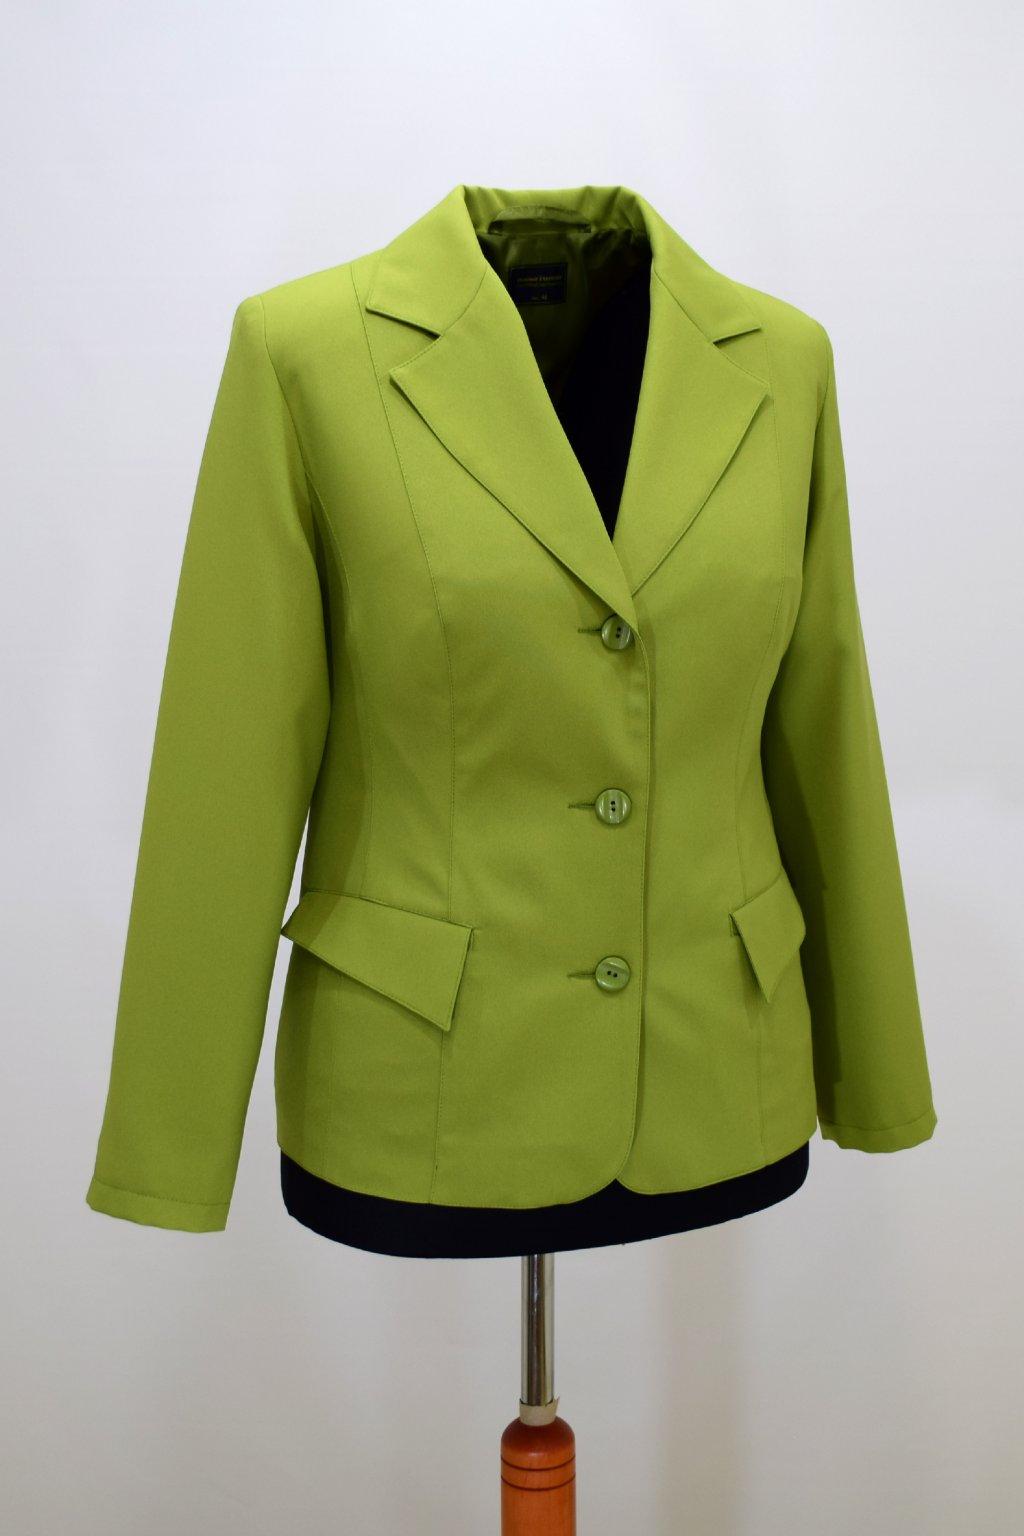 Dámské zelené sako Manon.